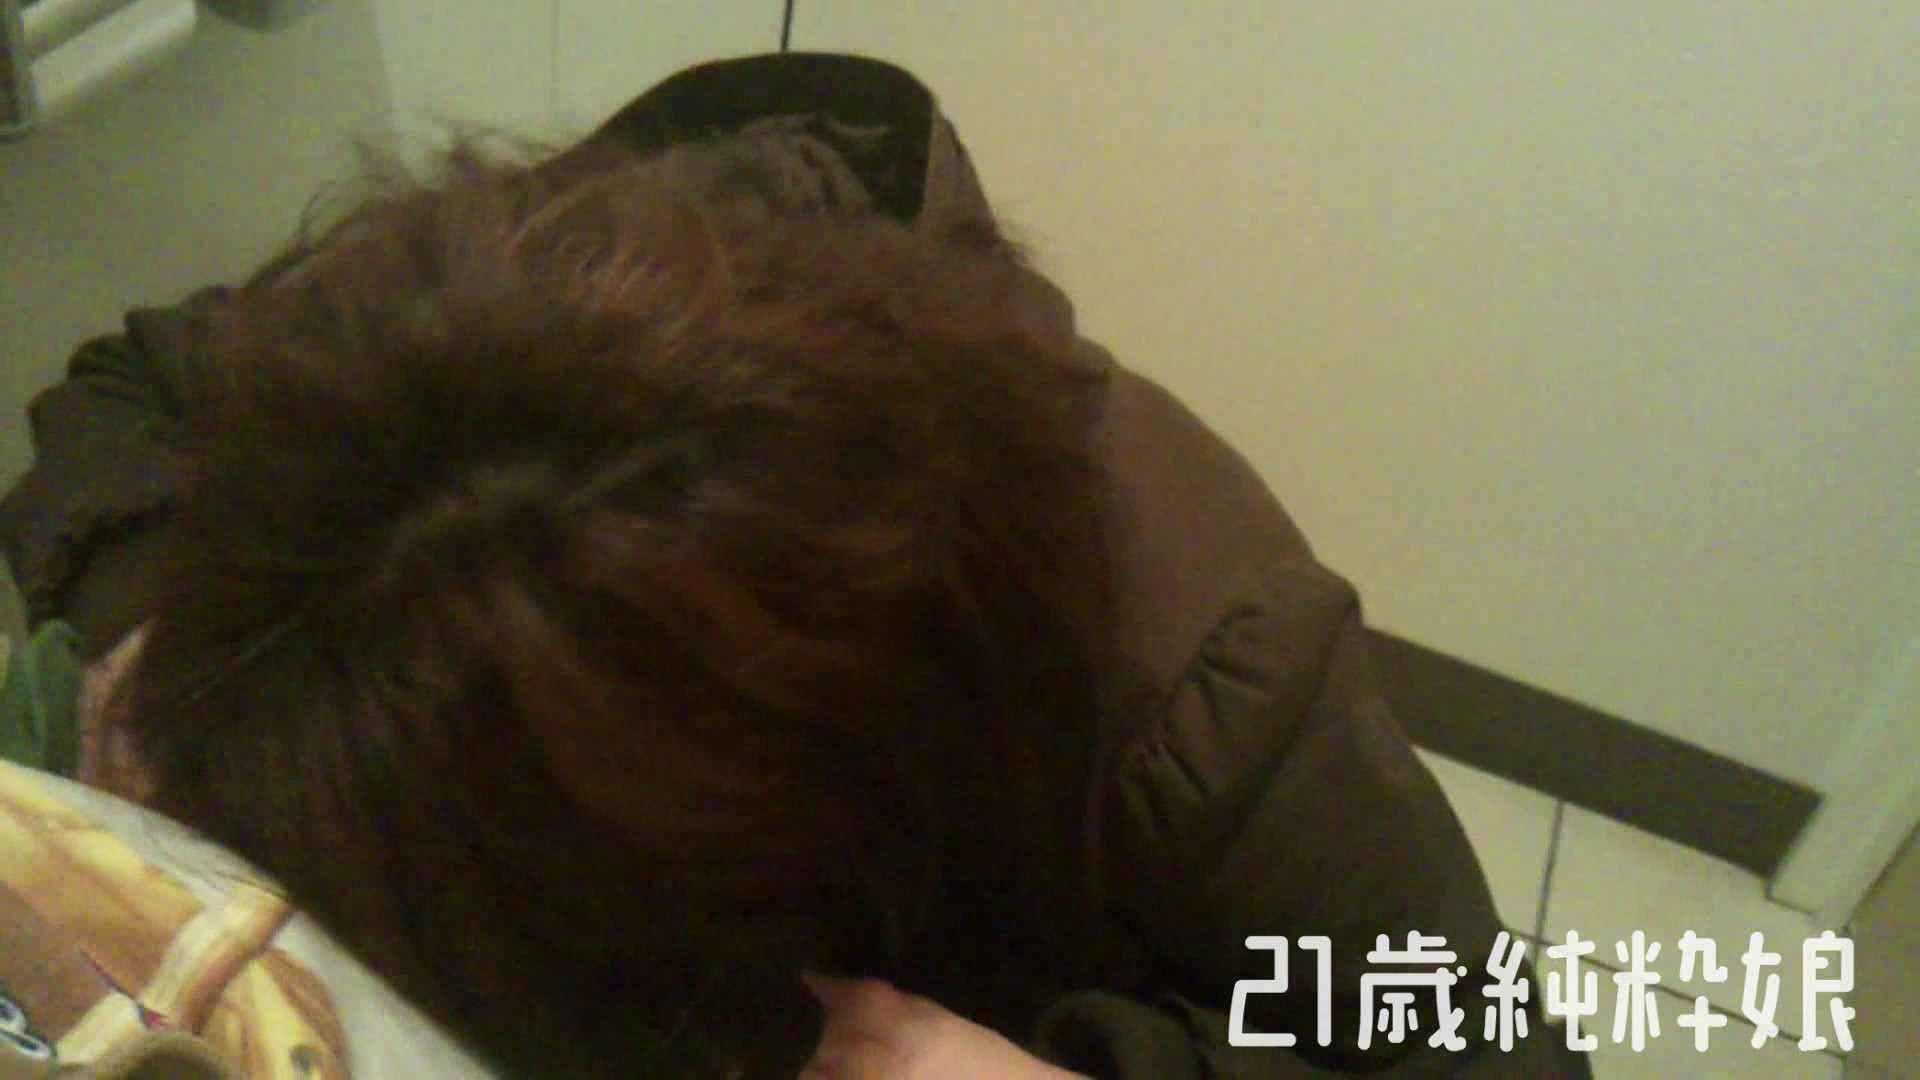 Gカップ21歳純粋嬢第2弾Vol.5 OLヌード天国  110PIX 68